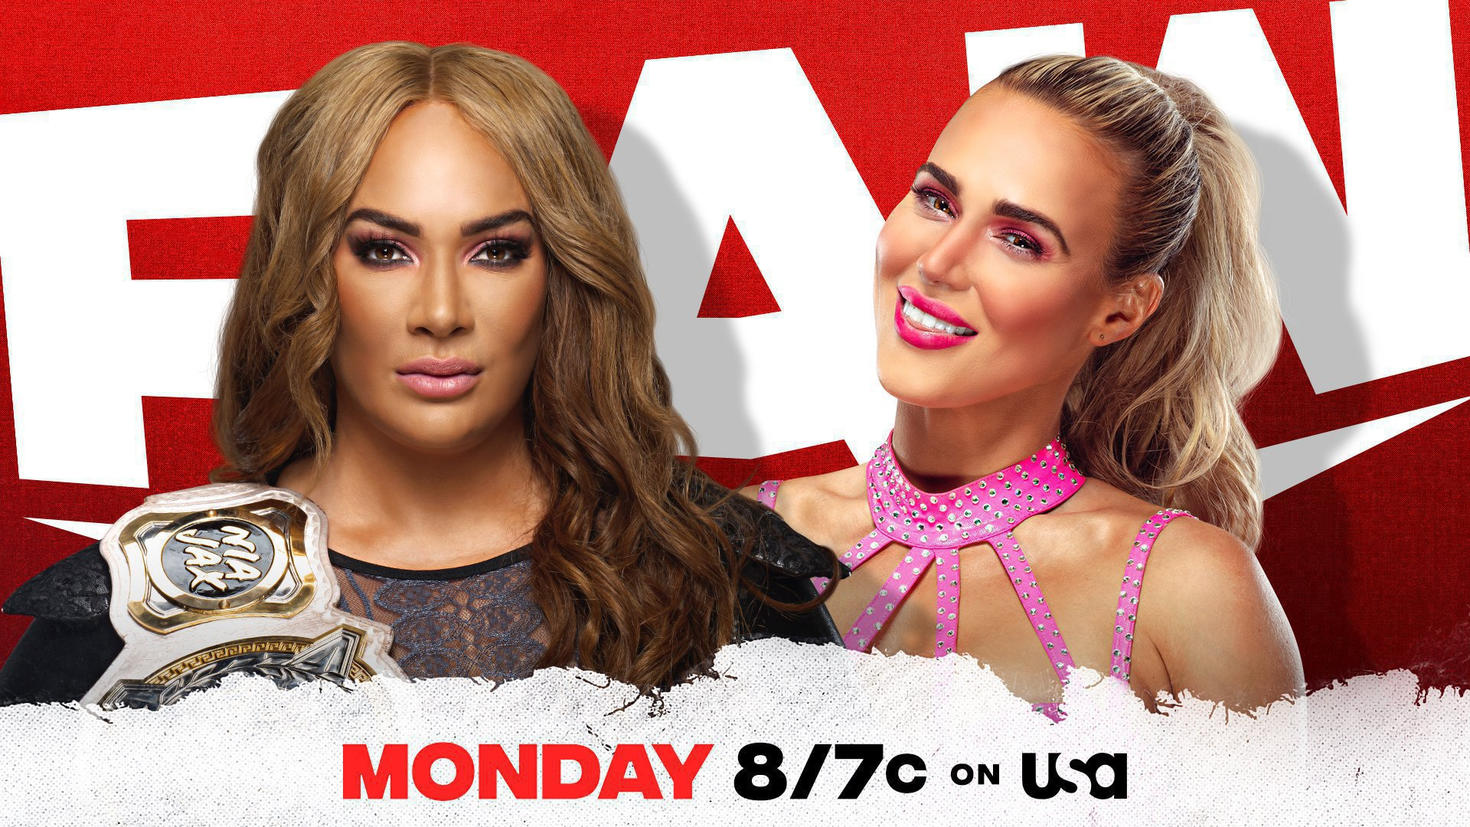 WWE Raw Preview (14/12/20): AJ Styles-Sheamus; Lana-Nia Jax, TLC Go-Home Episode 108